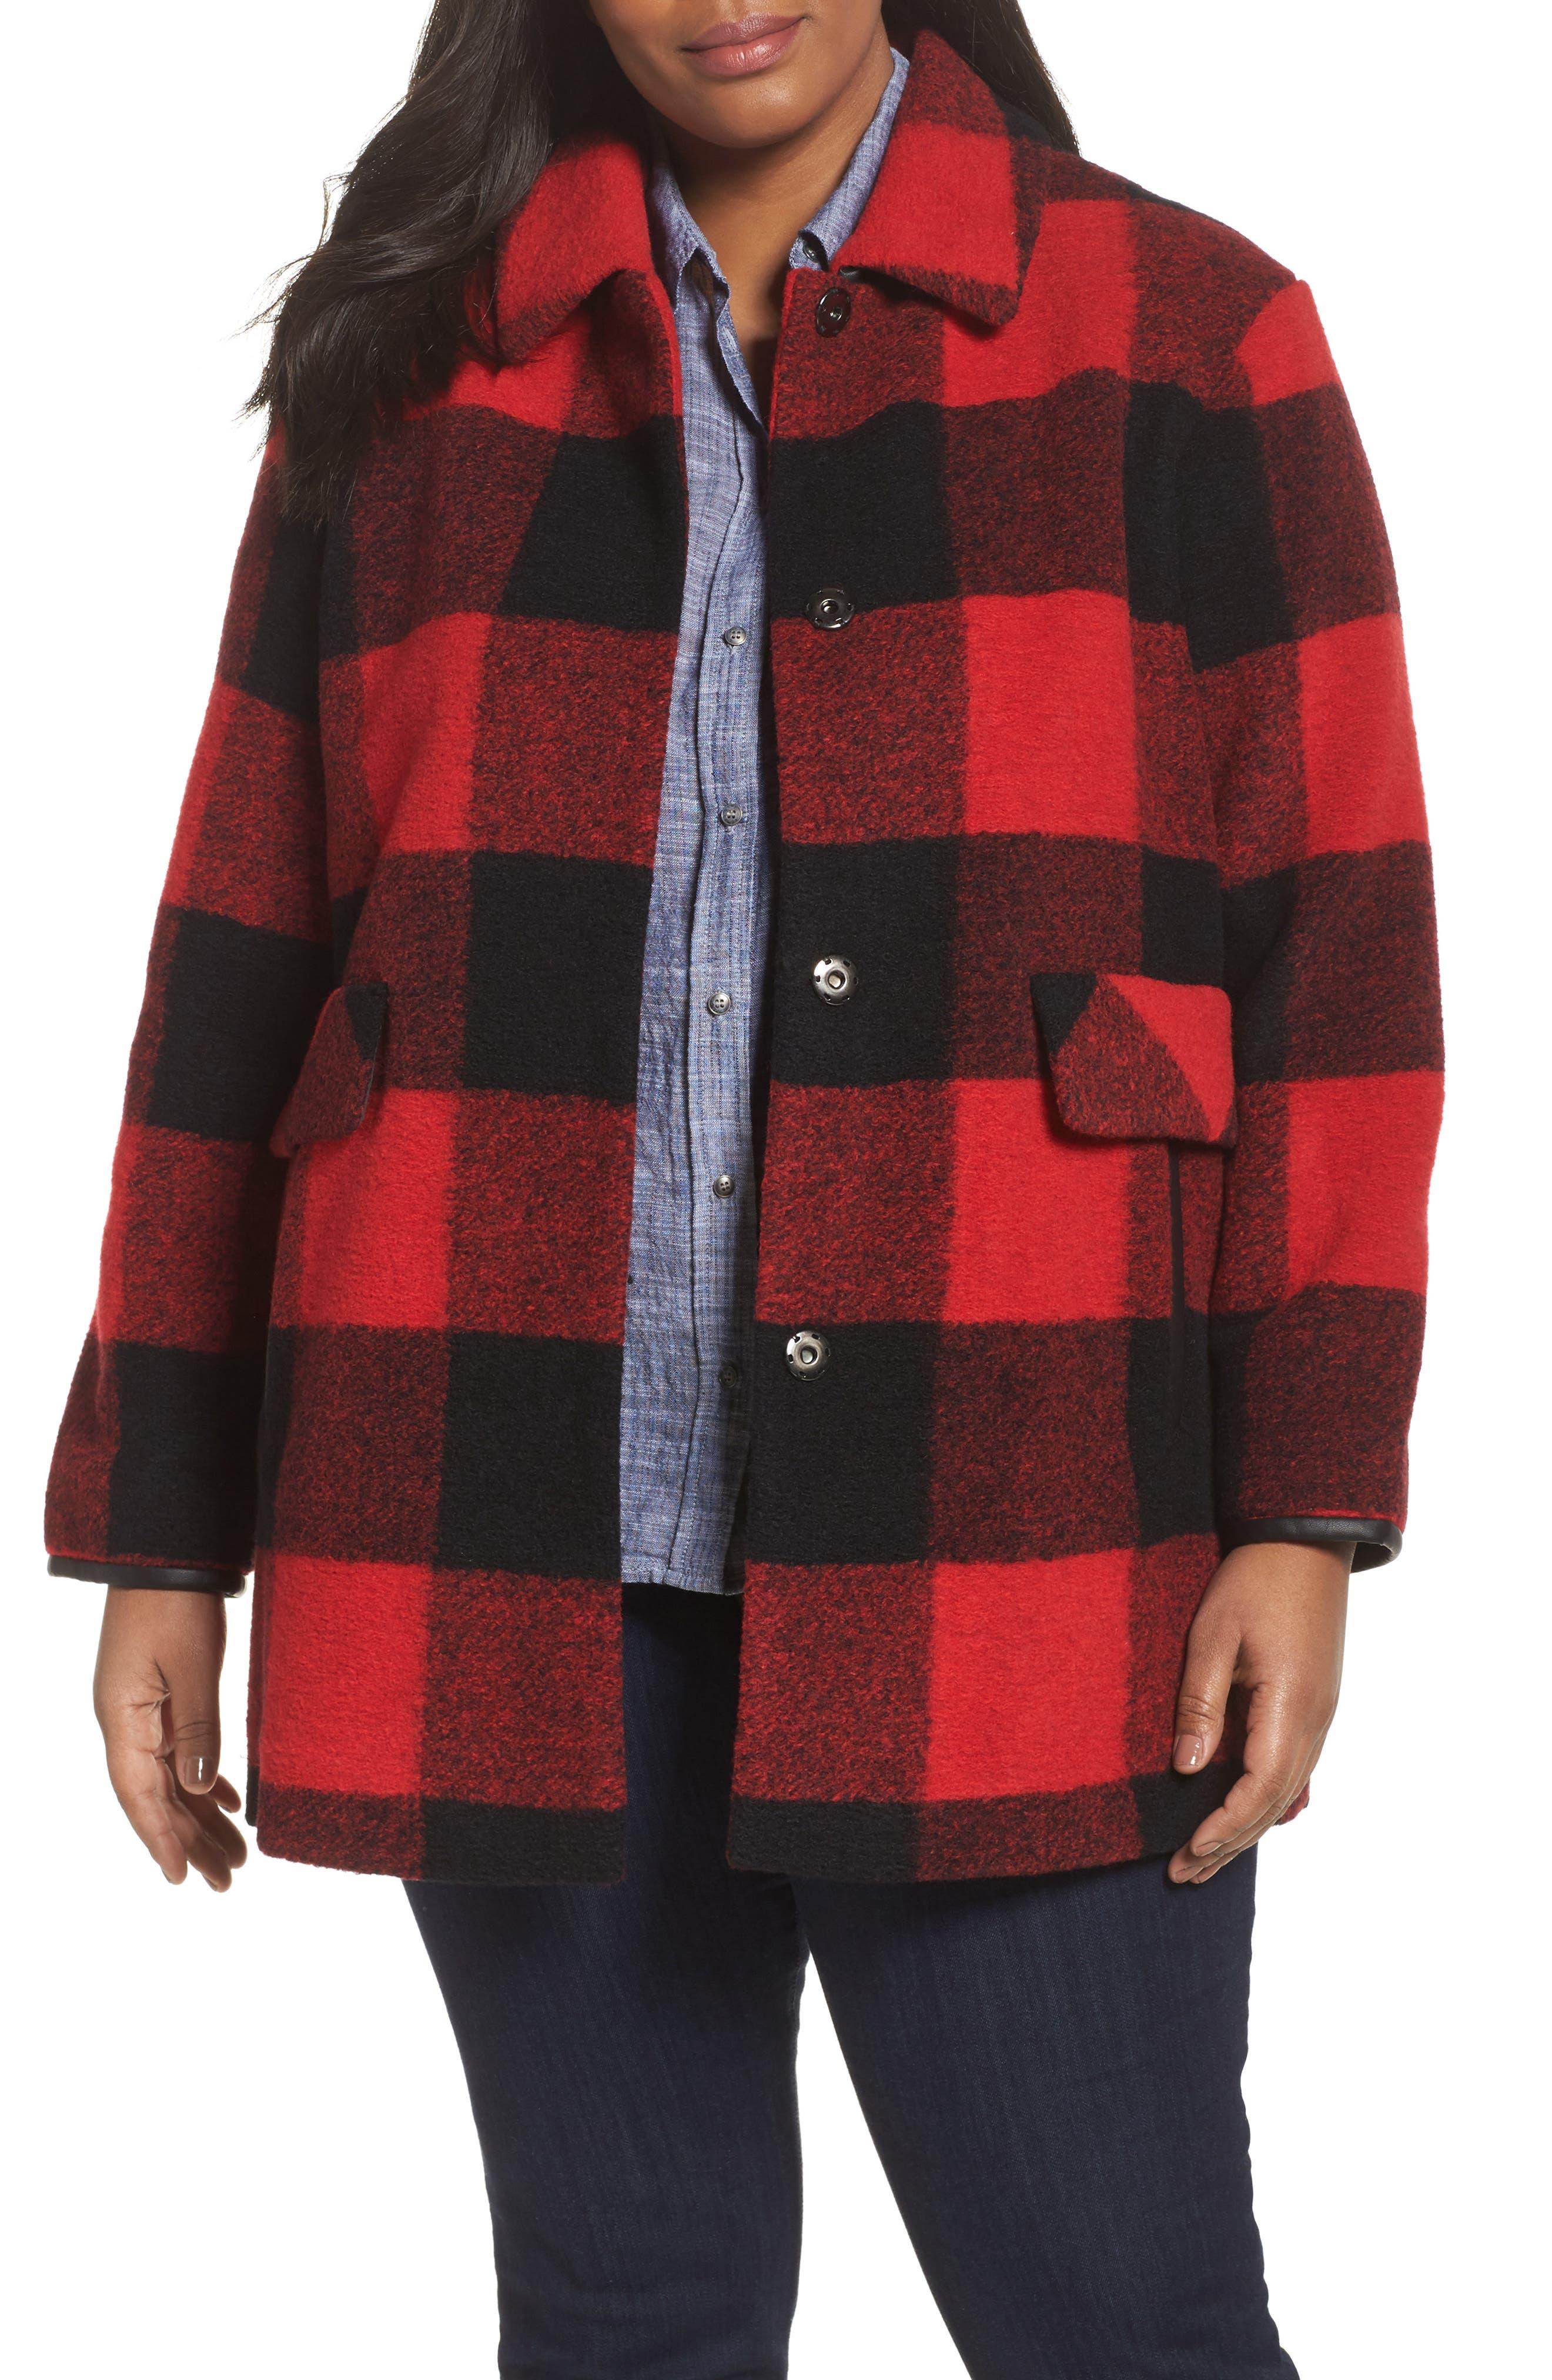 Main Image - Pendleton Paul Bunyan Plaid Wool Blend Barn Coat (Plus Size)